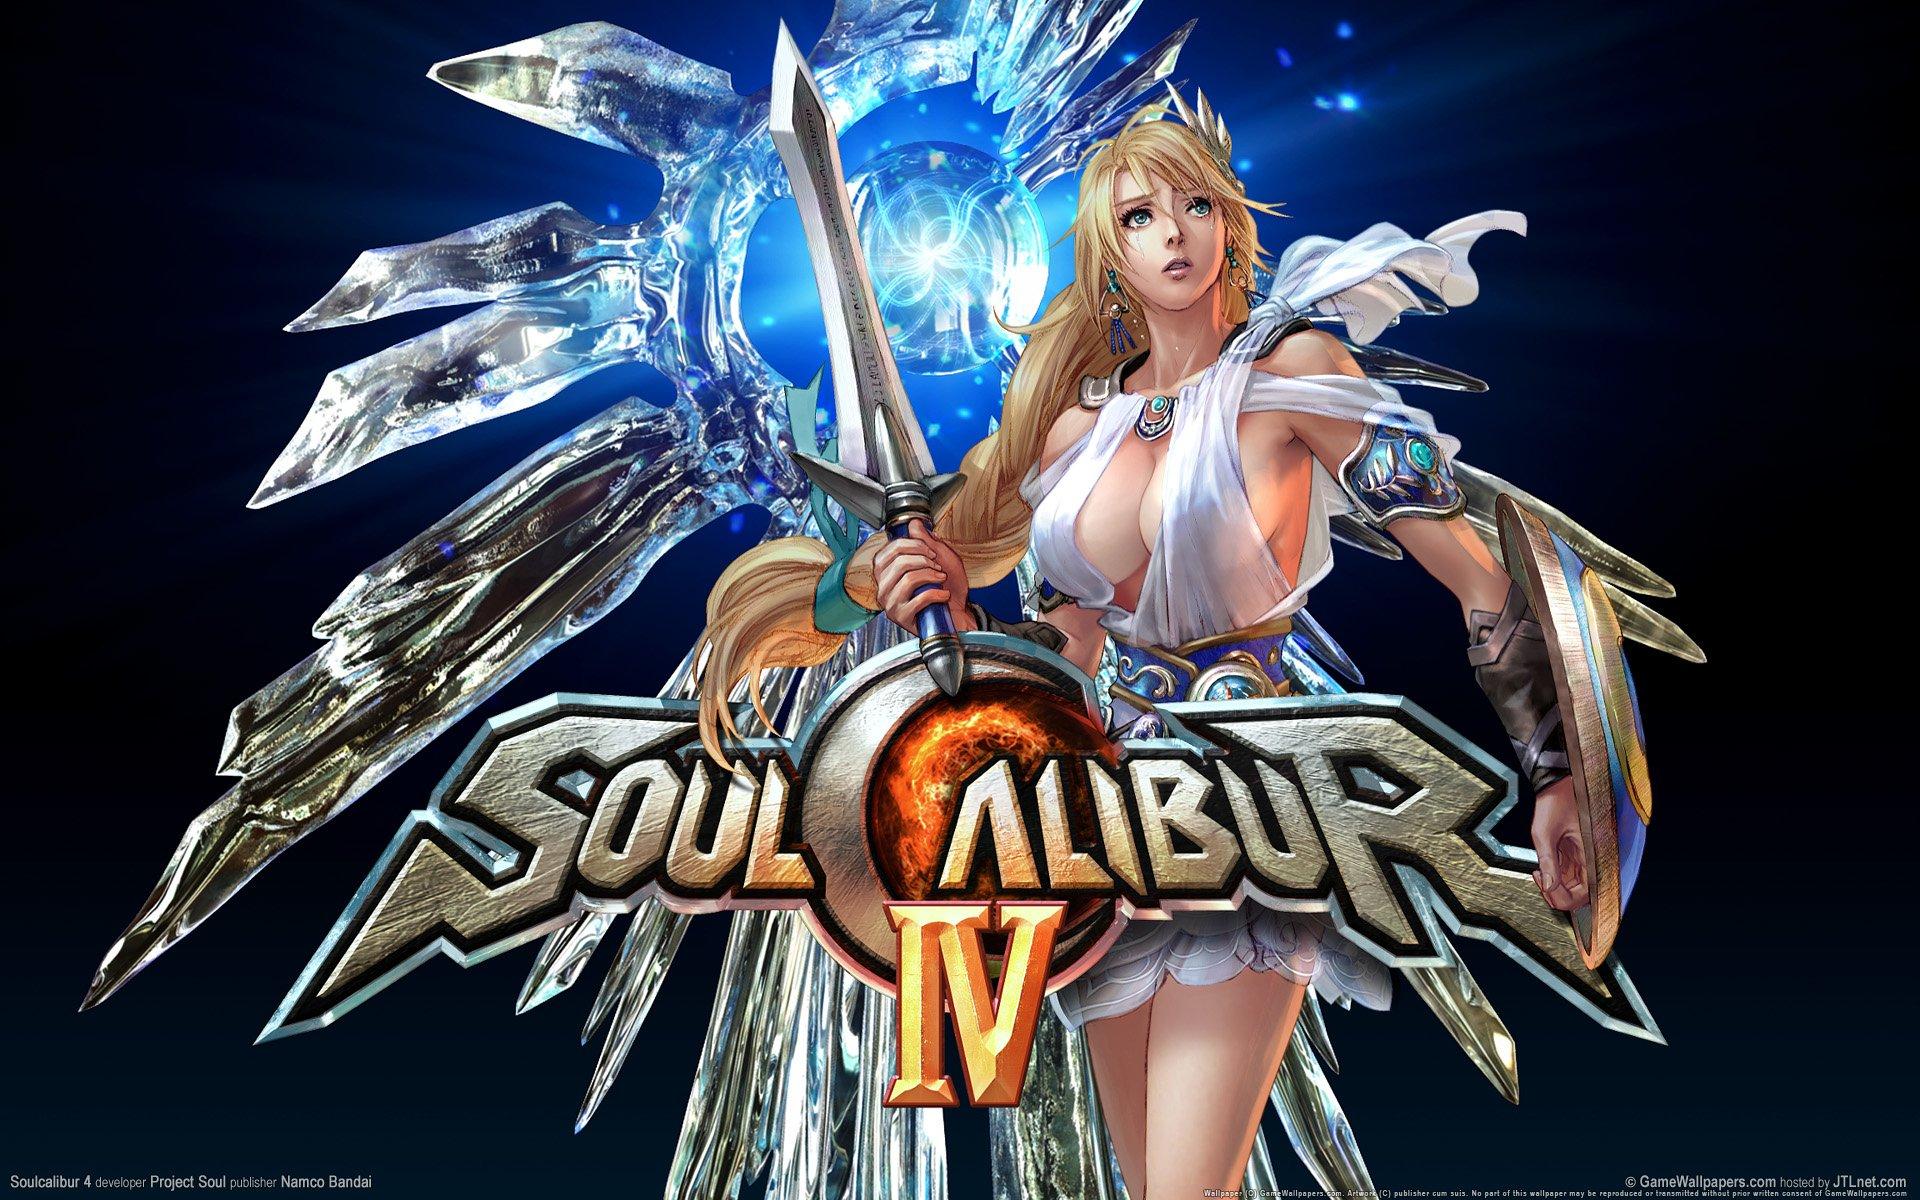 Soulcalibur hd wallpaper background image 1920x1200 - Soul calibur wallpaper ...